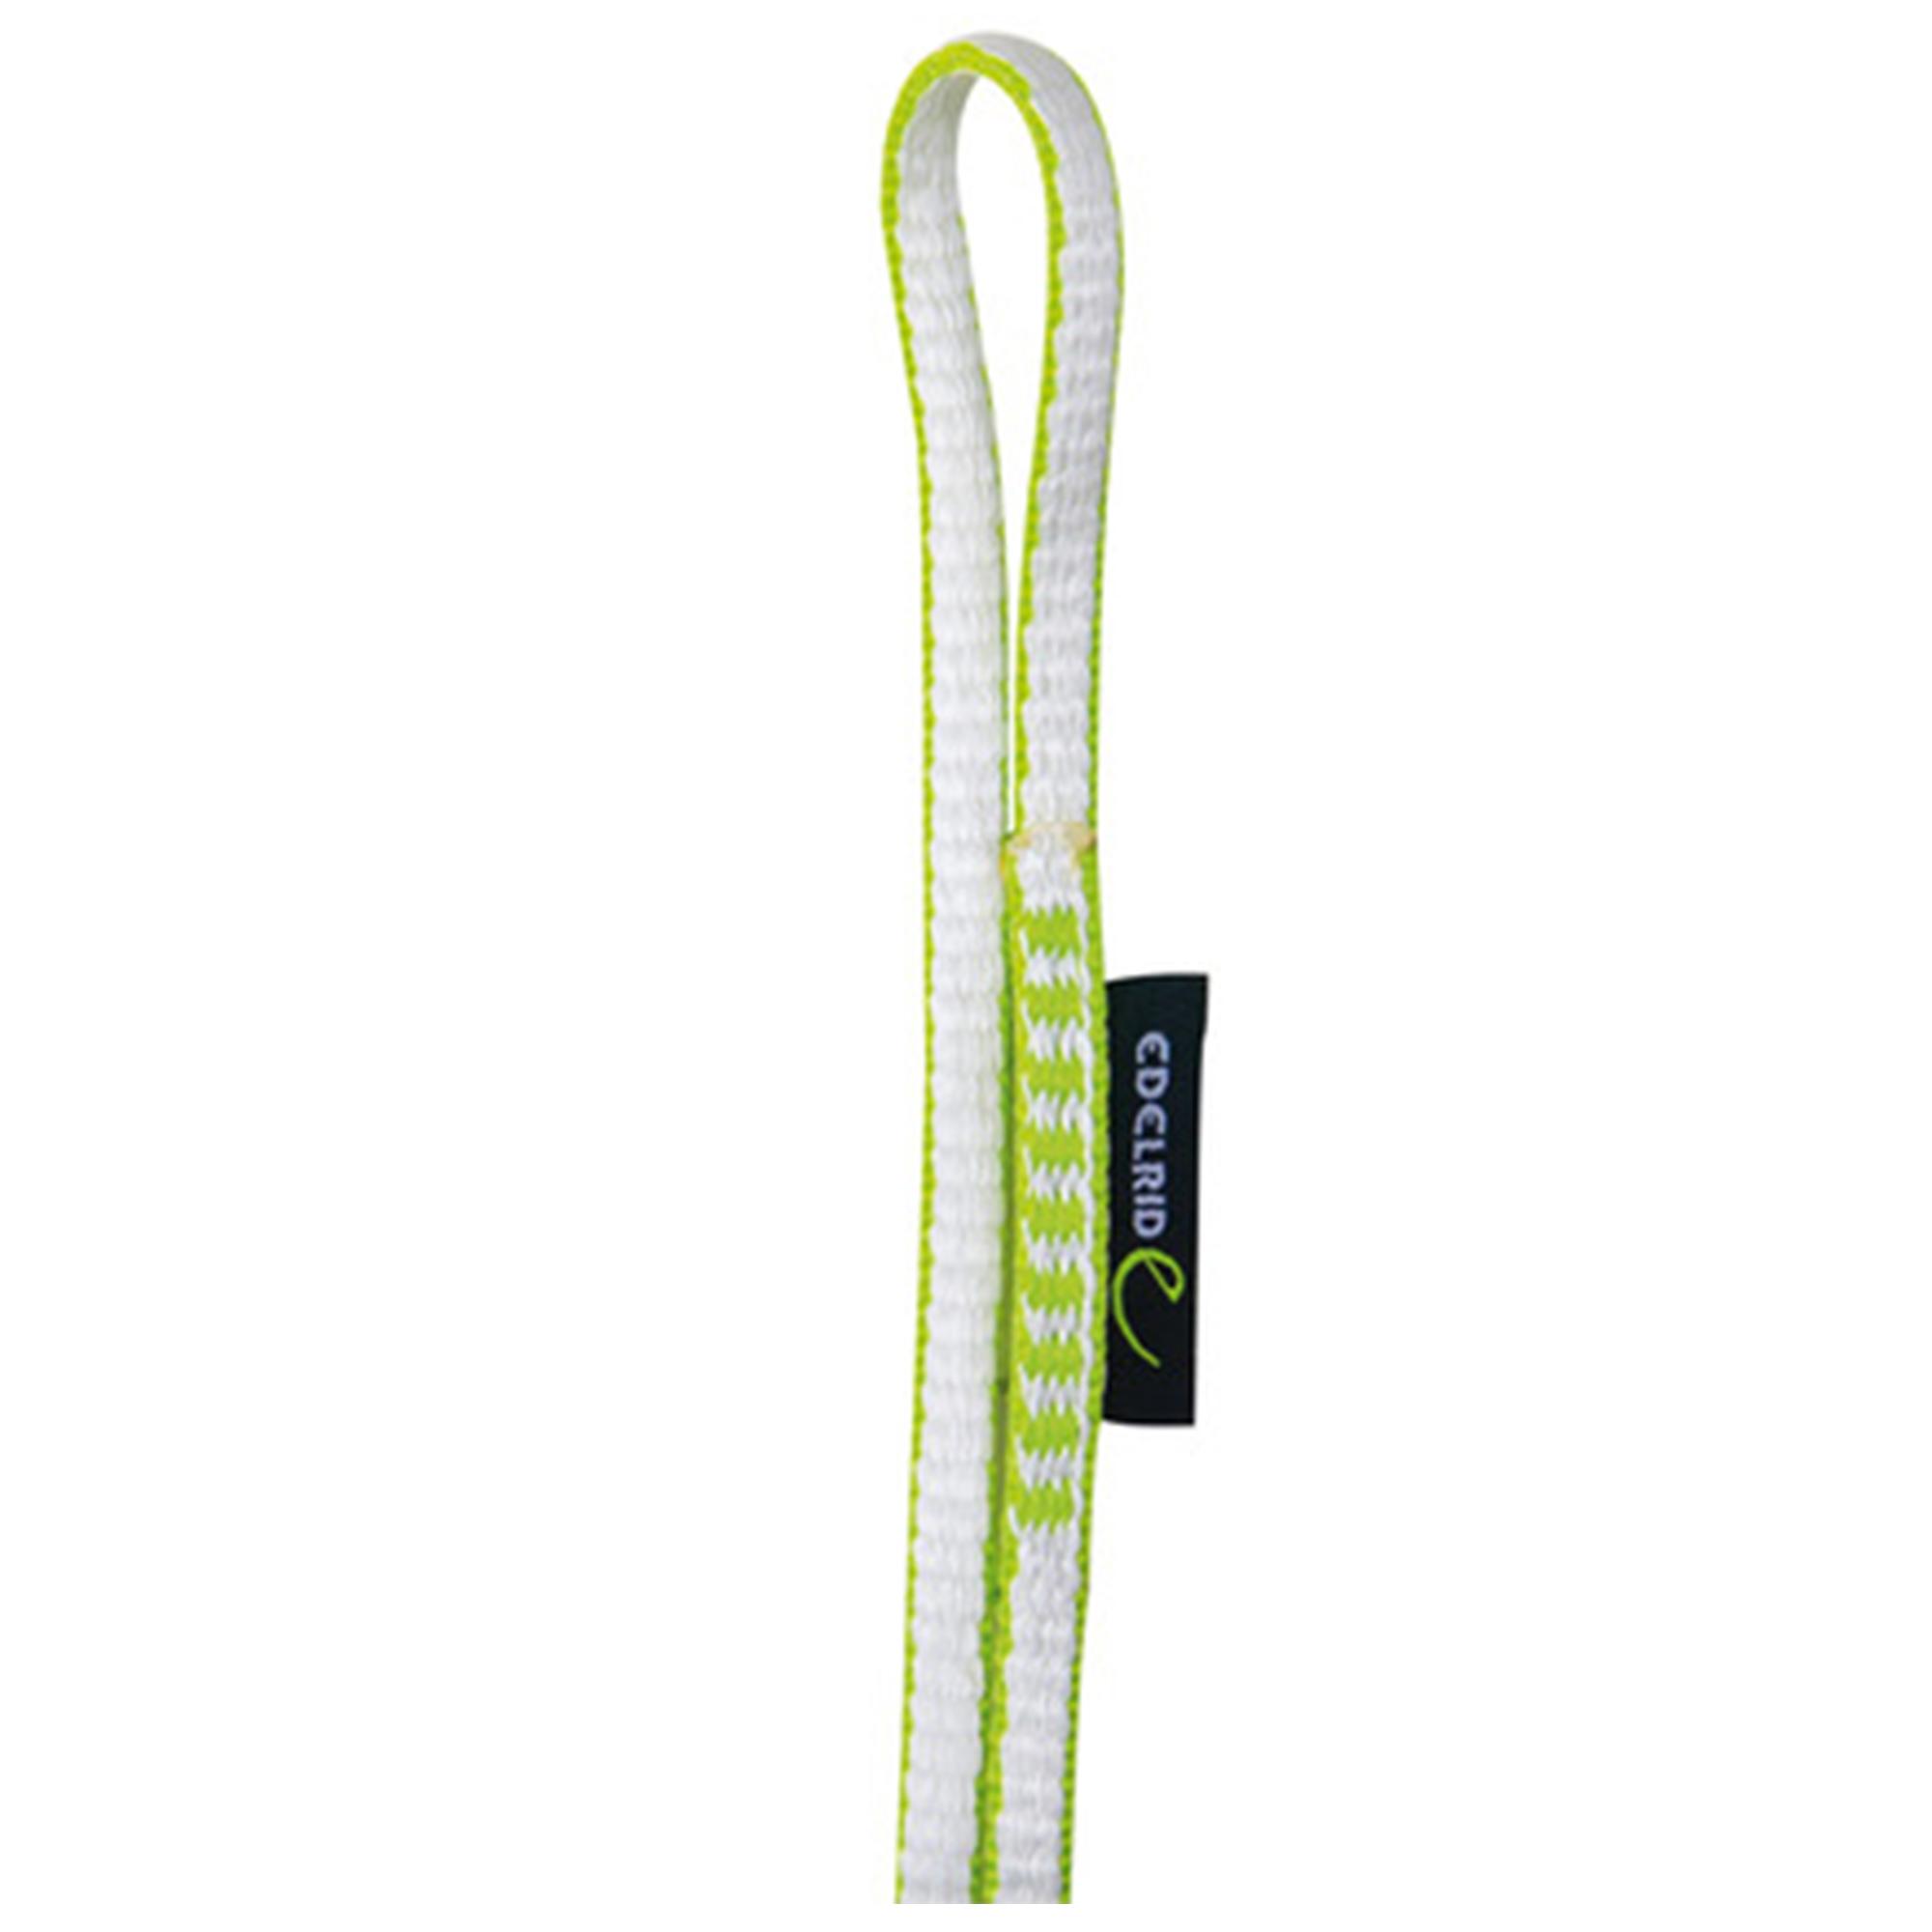 Rundschlinge Edelrid Dyneema®-Sling 60cm oasis 11mm